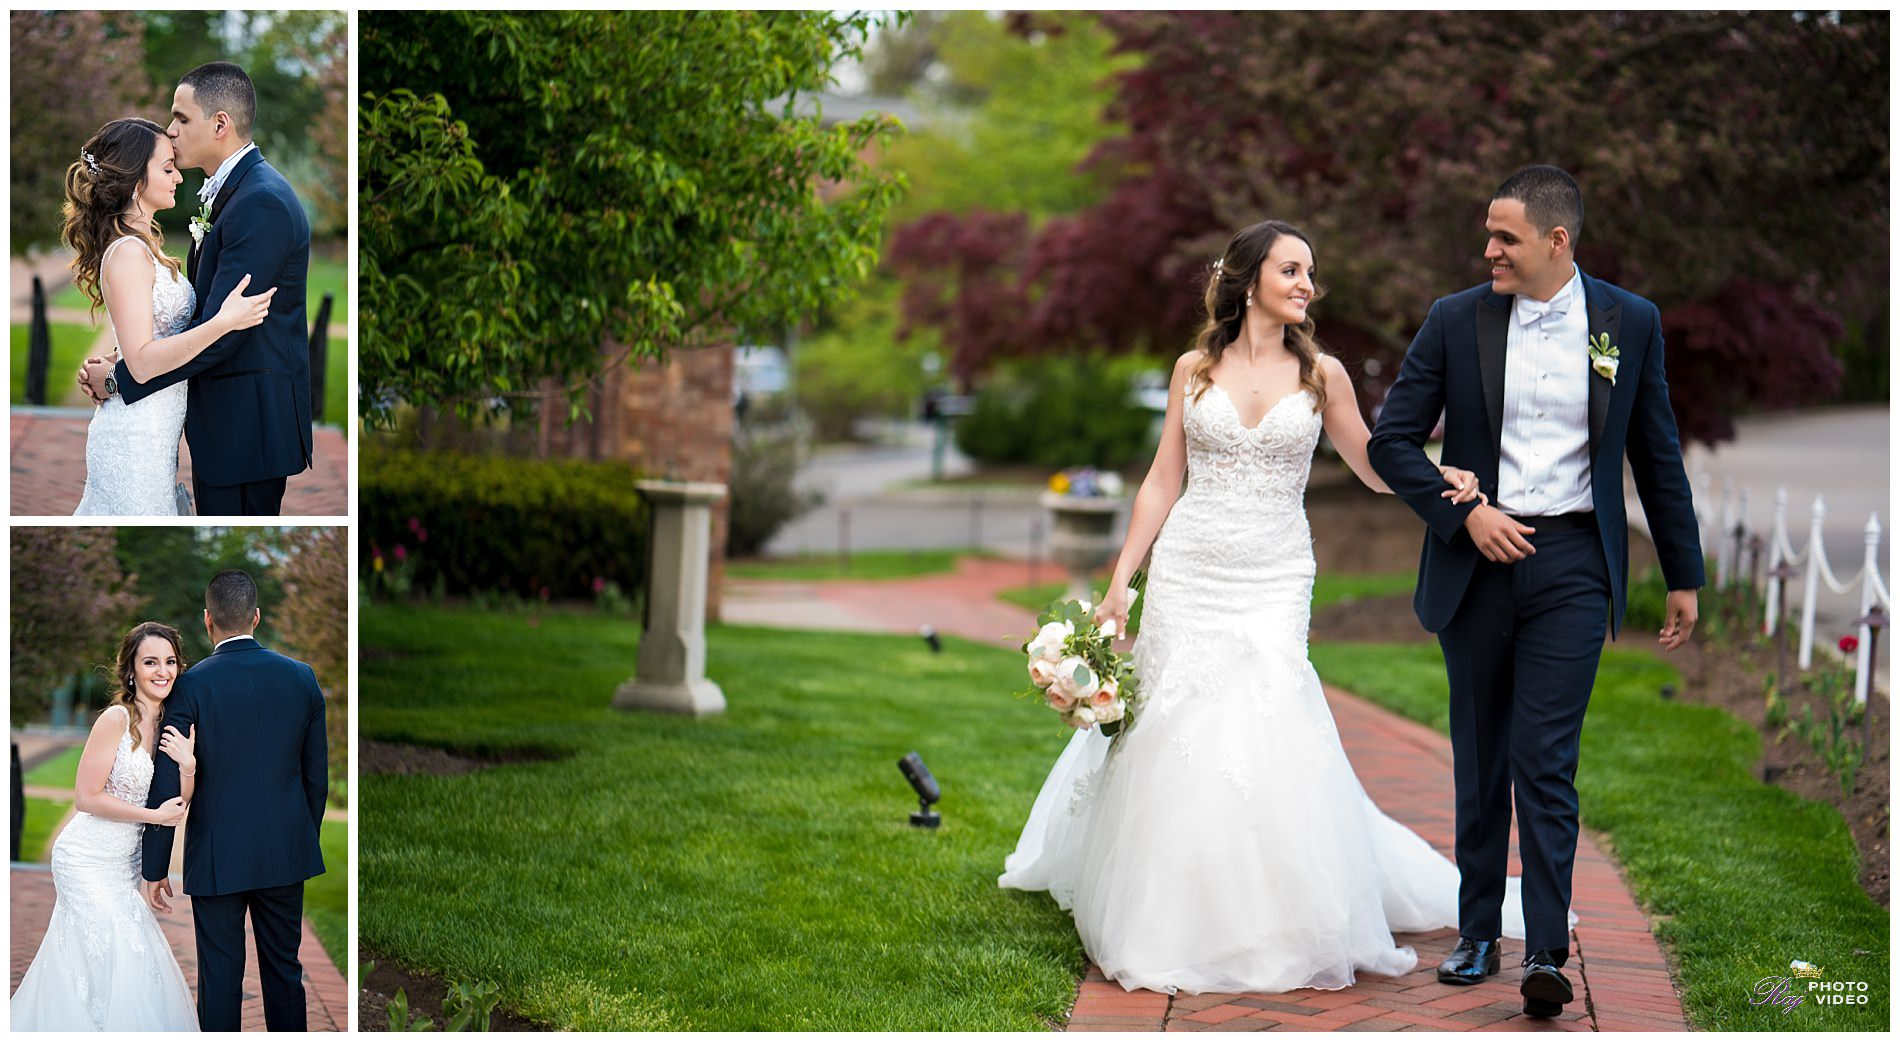 The-Manor-West-Orange-NJ-Wedding-Reception-Yanet-Jose-2.jpg